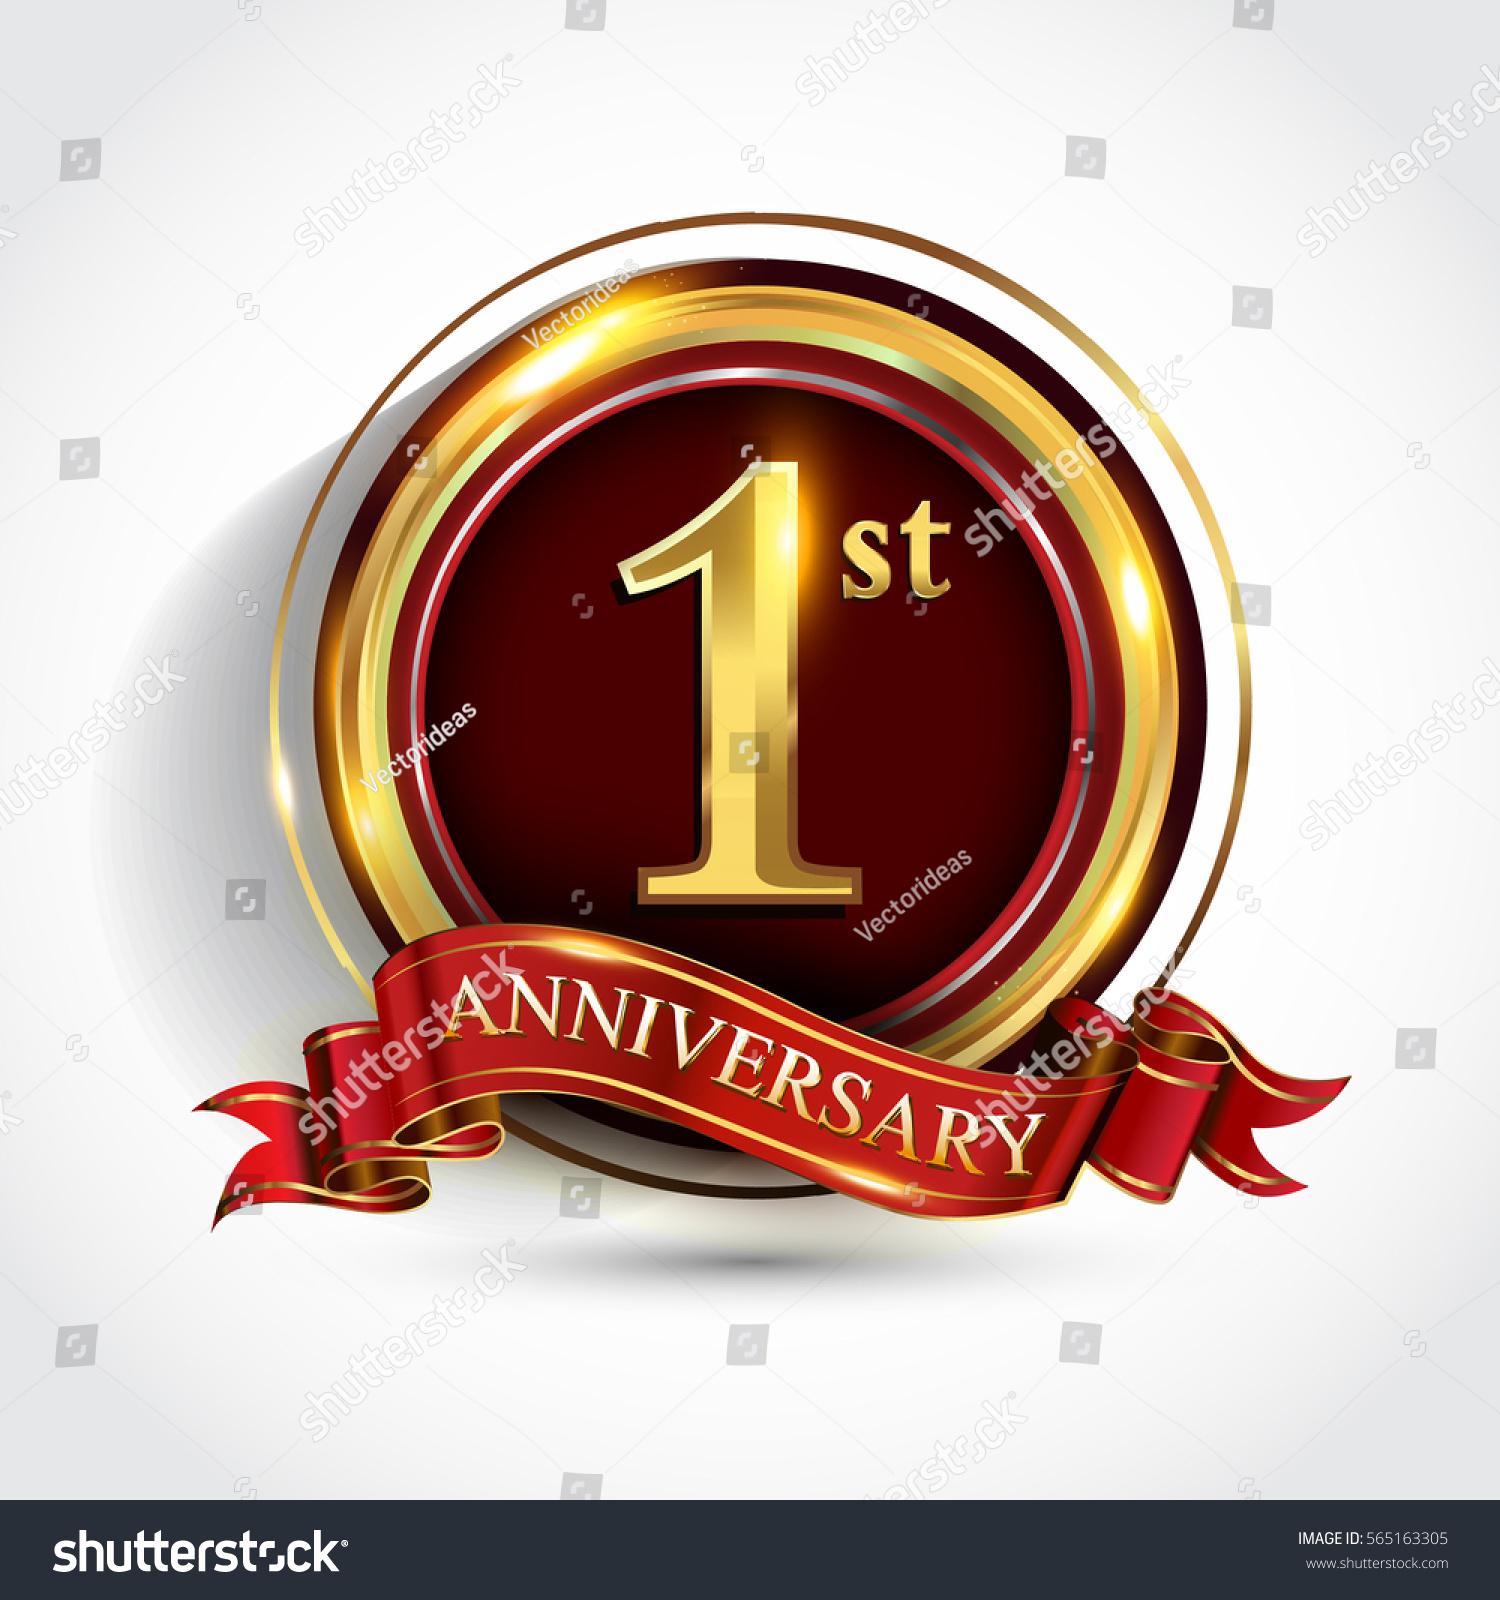 Celebrating st golden anniversary one year stock vector